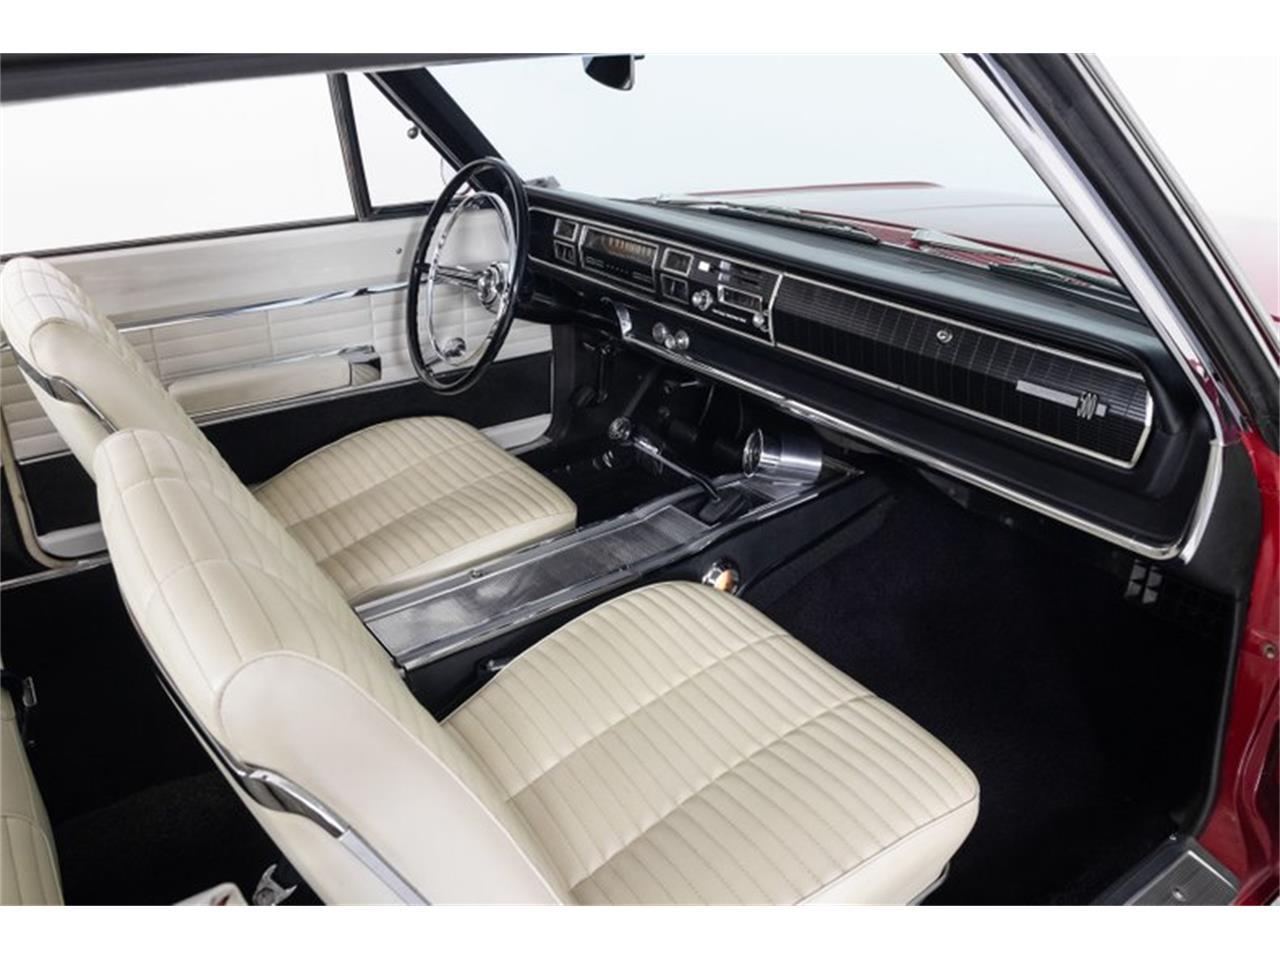 1966 Dodge Coronet (CC-1322883) for sale in St. Charles, Missouri